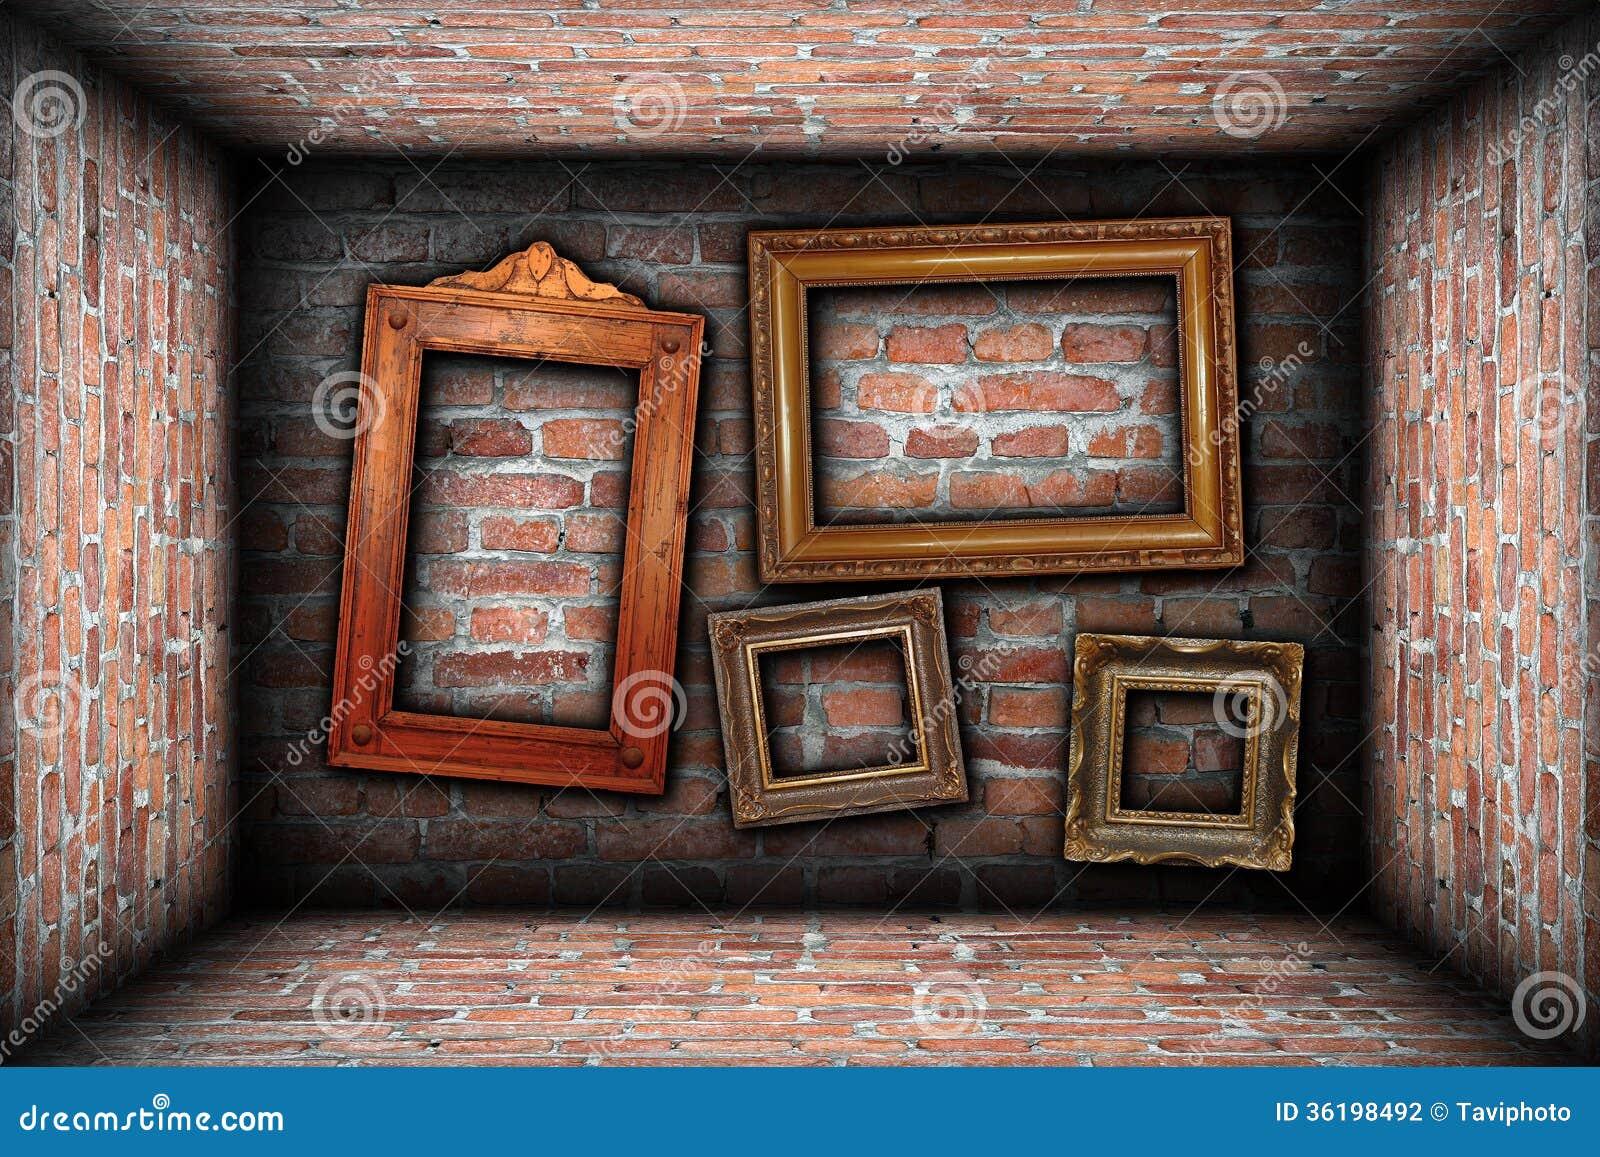 Antique Wood Picture Frames